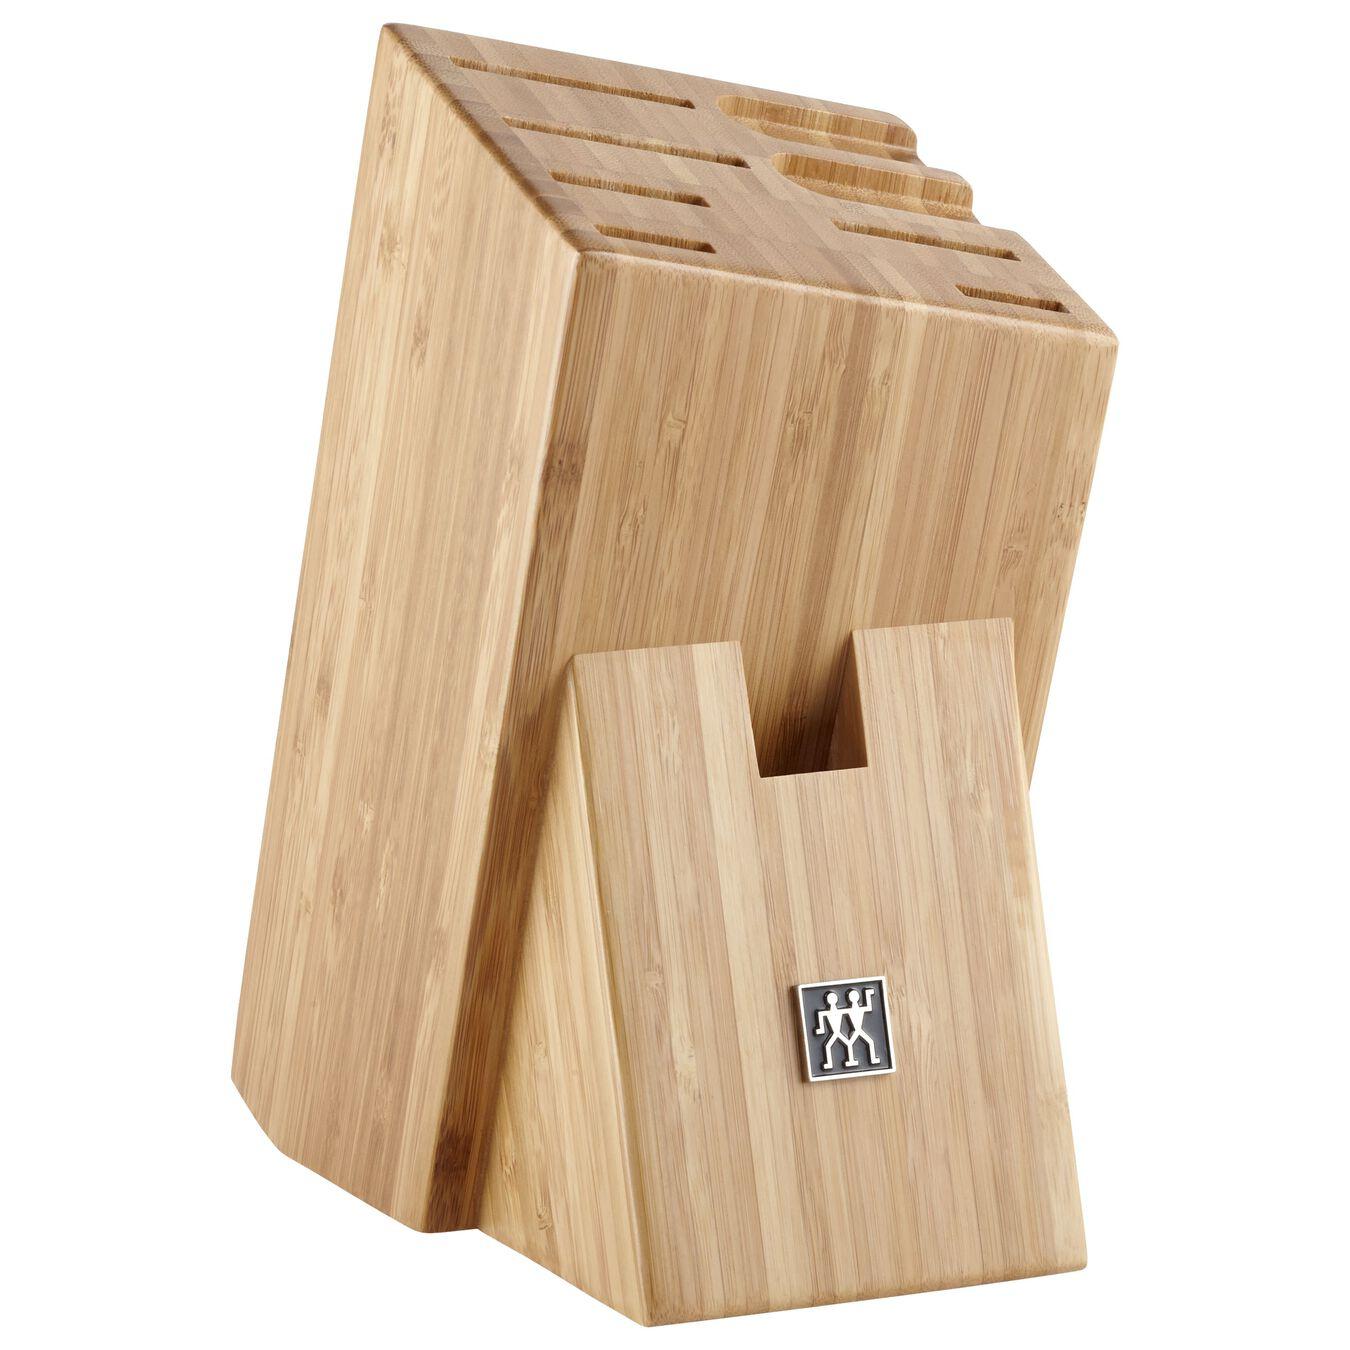 7 Piece Knife block set,,large 9